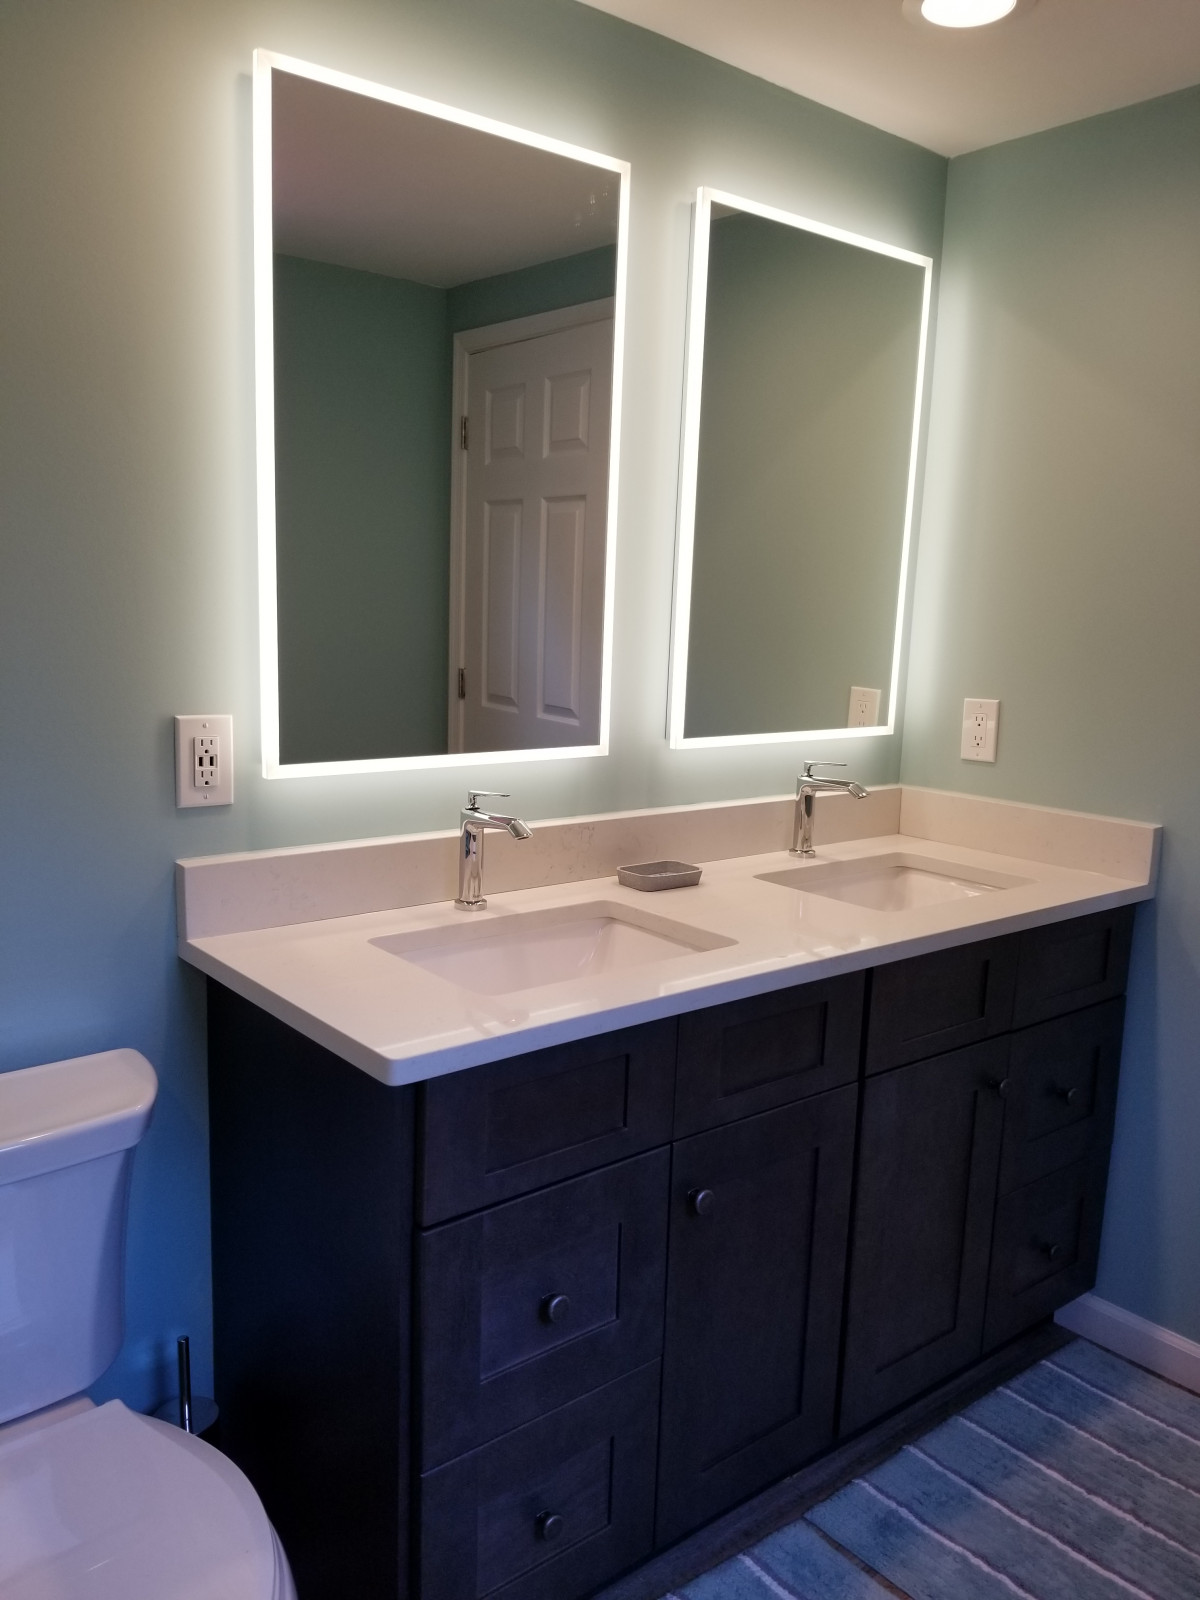 Bathrooms 121